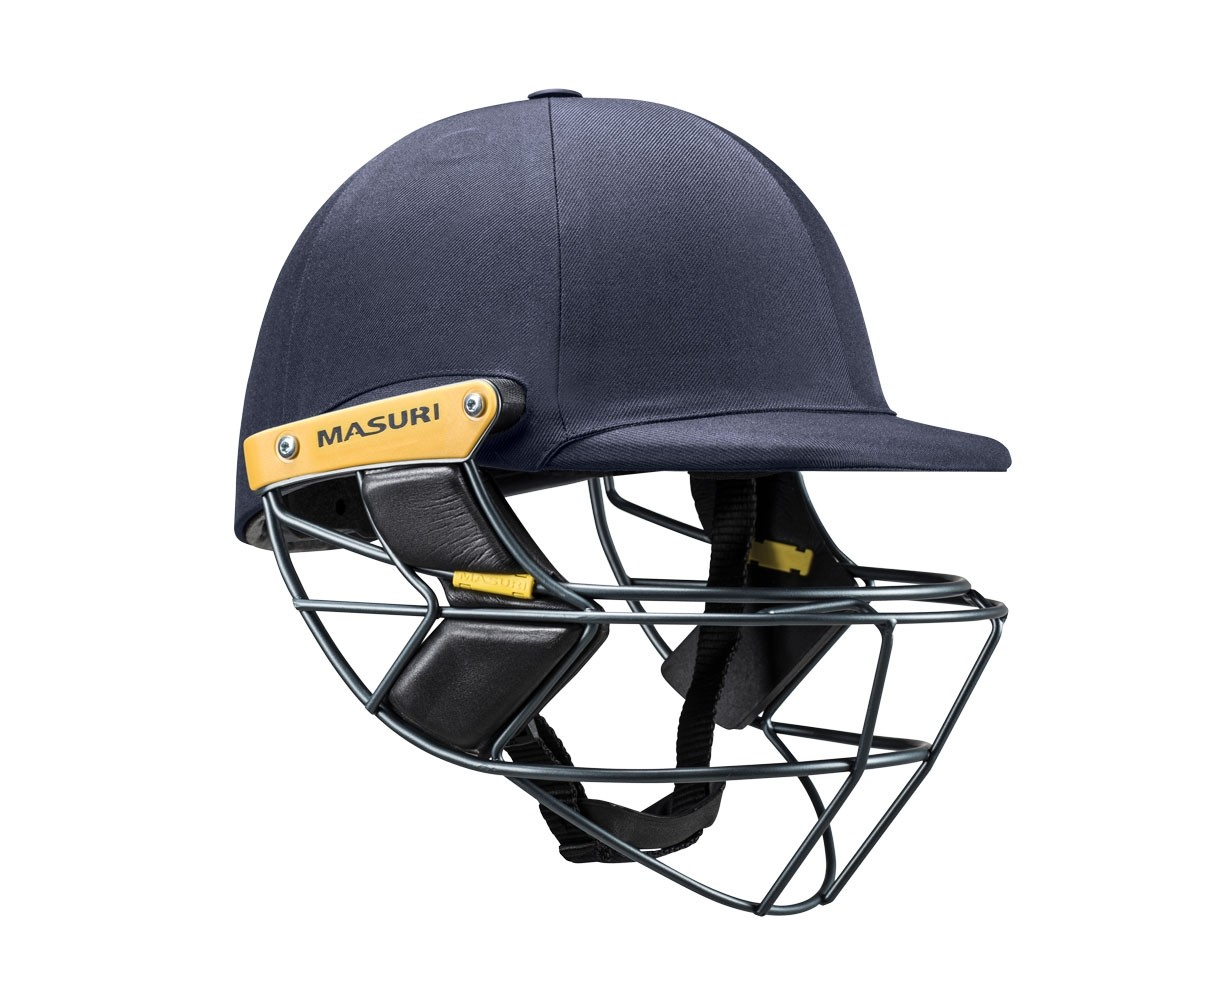 2021 Masuri E-Line Steel Cricket Helmet